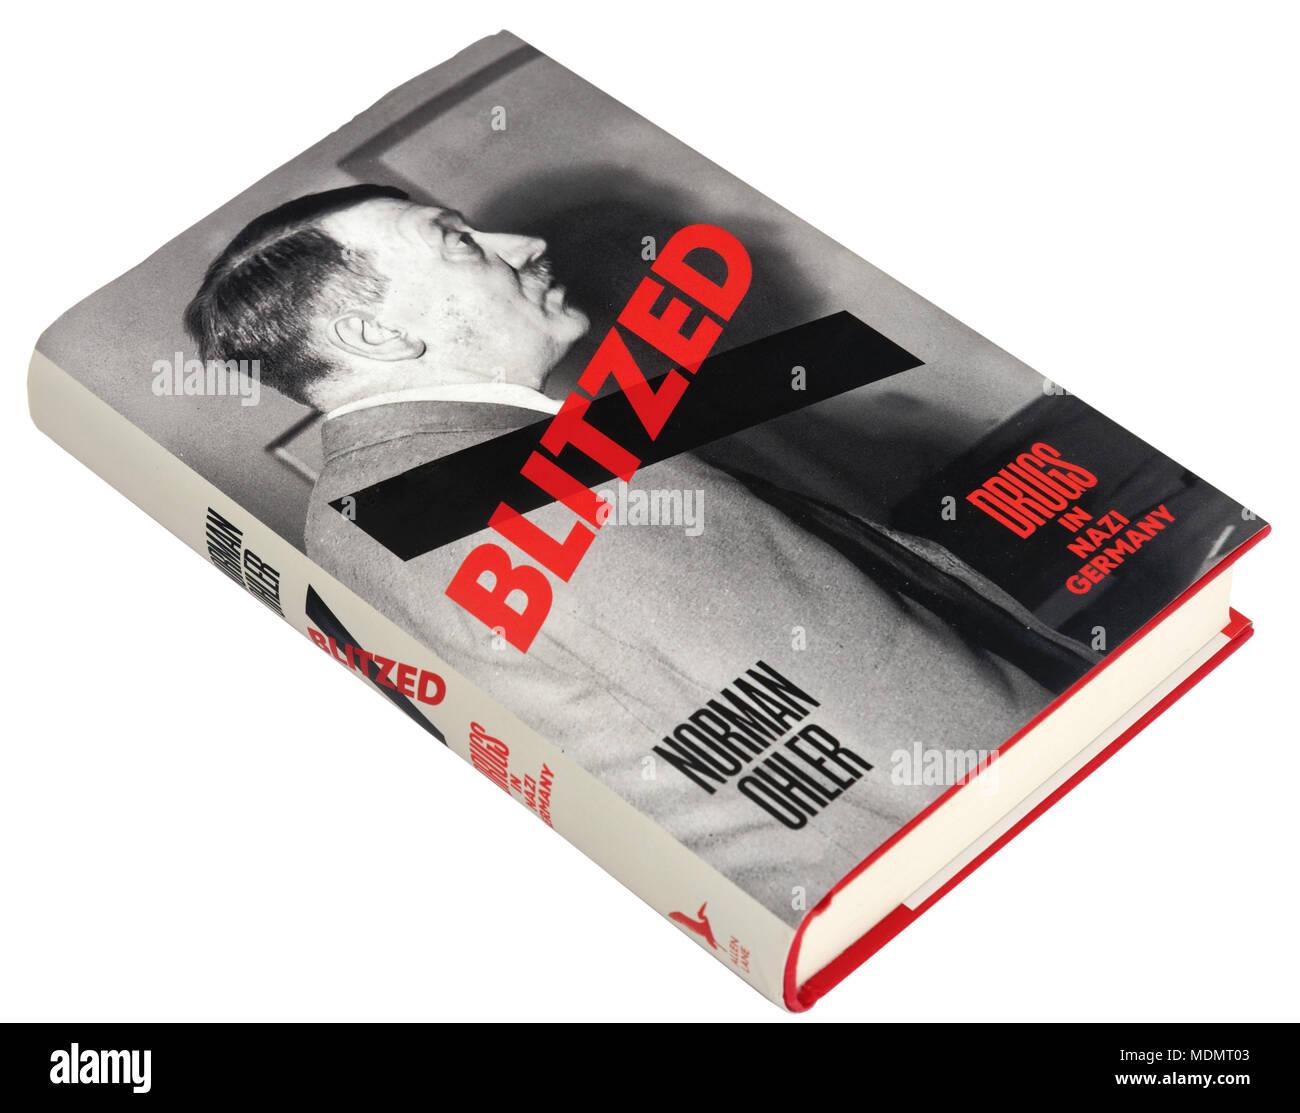 Blitzed by Norman Ohler Stock Photo: 180552067 - Alamy